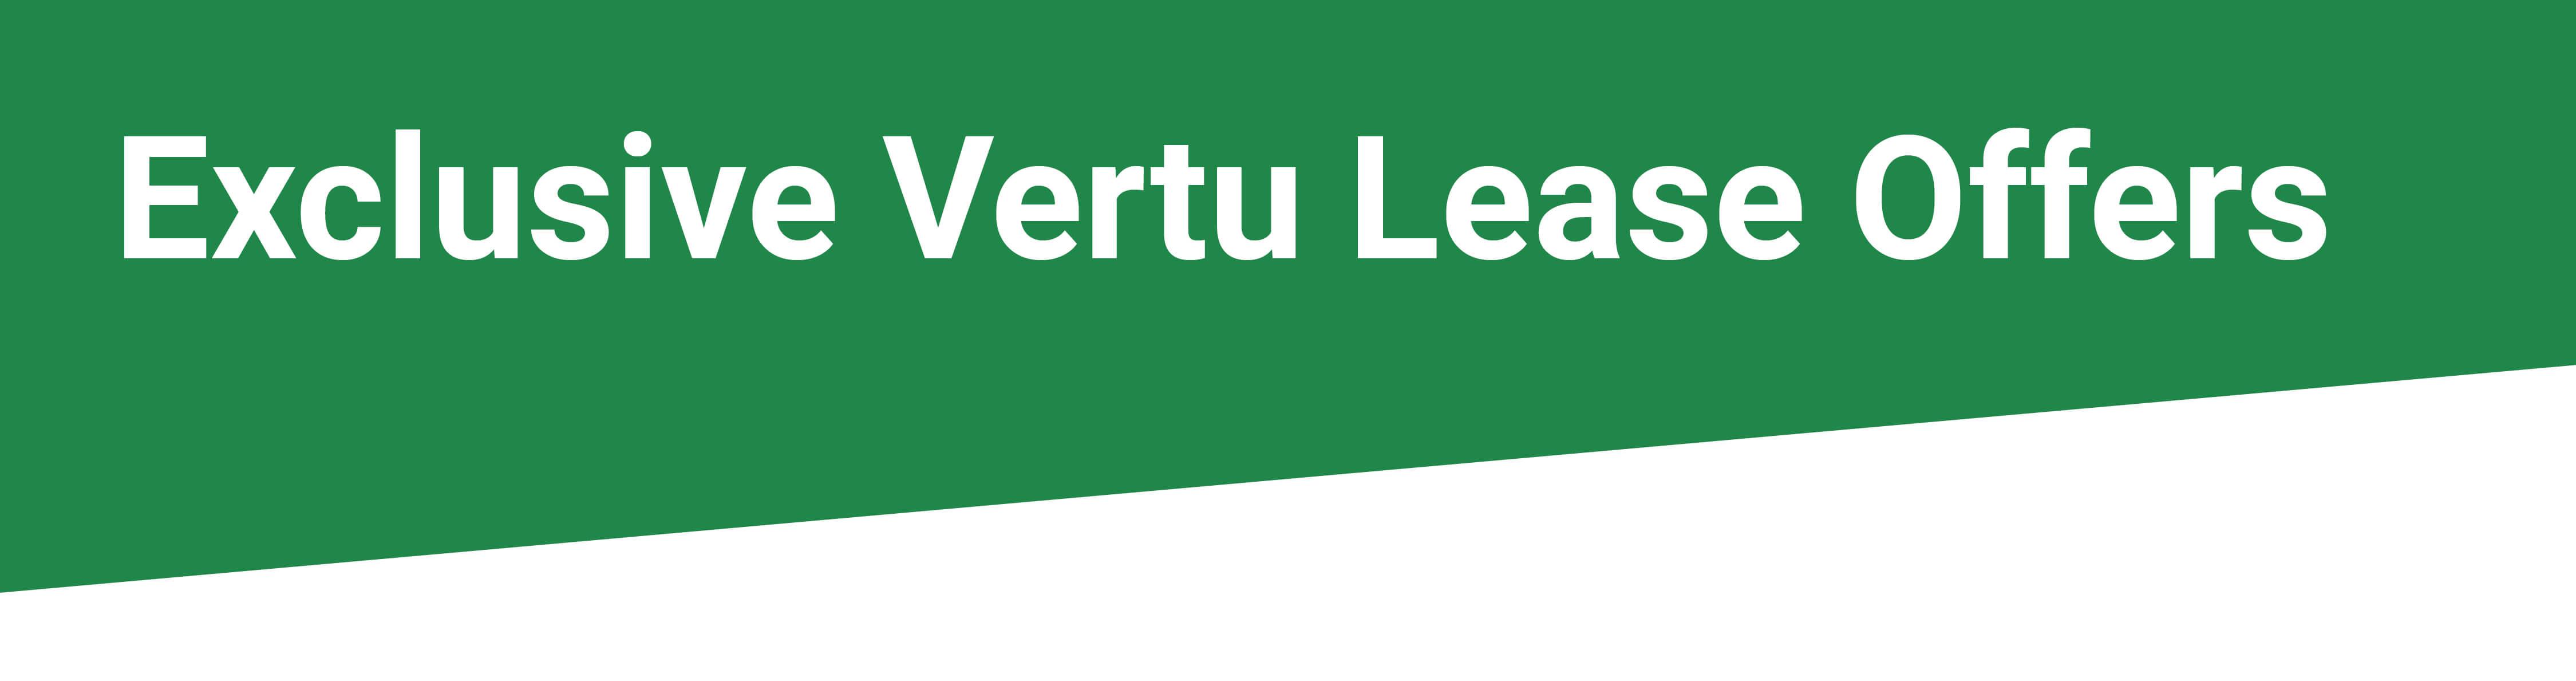 Exclusive Vertu lease offers